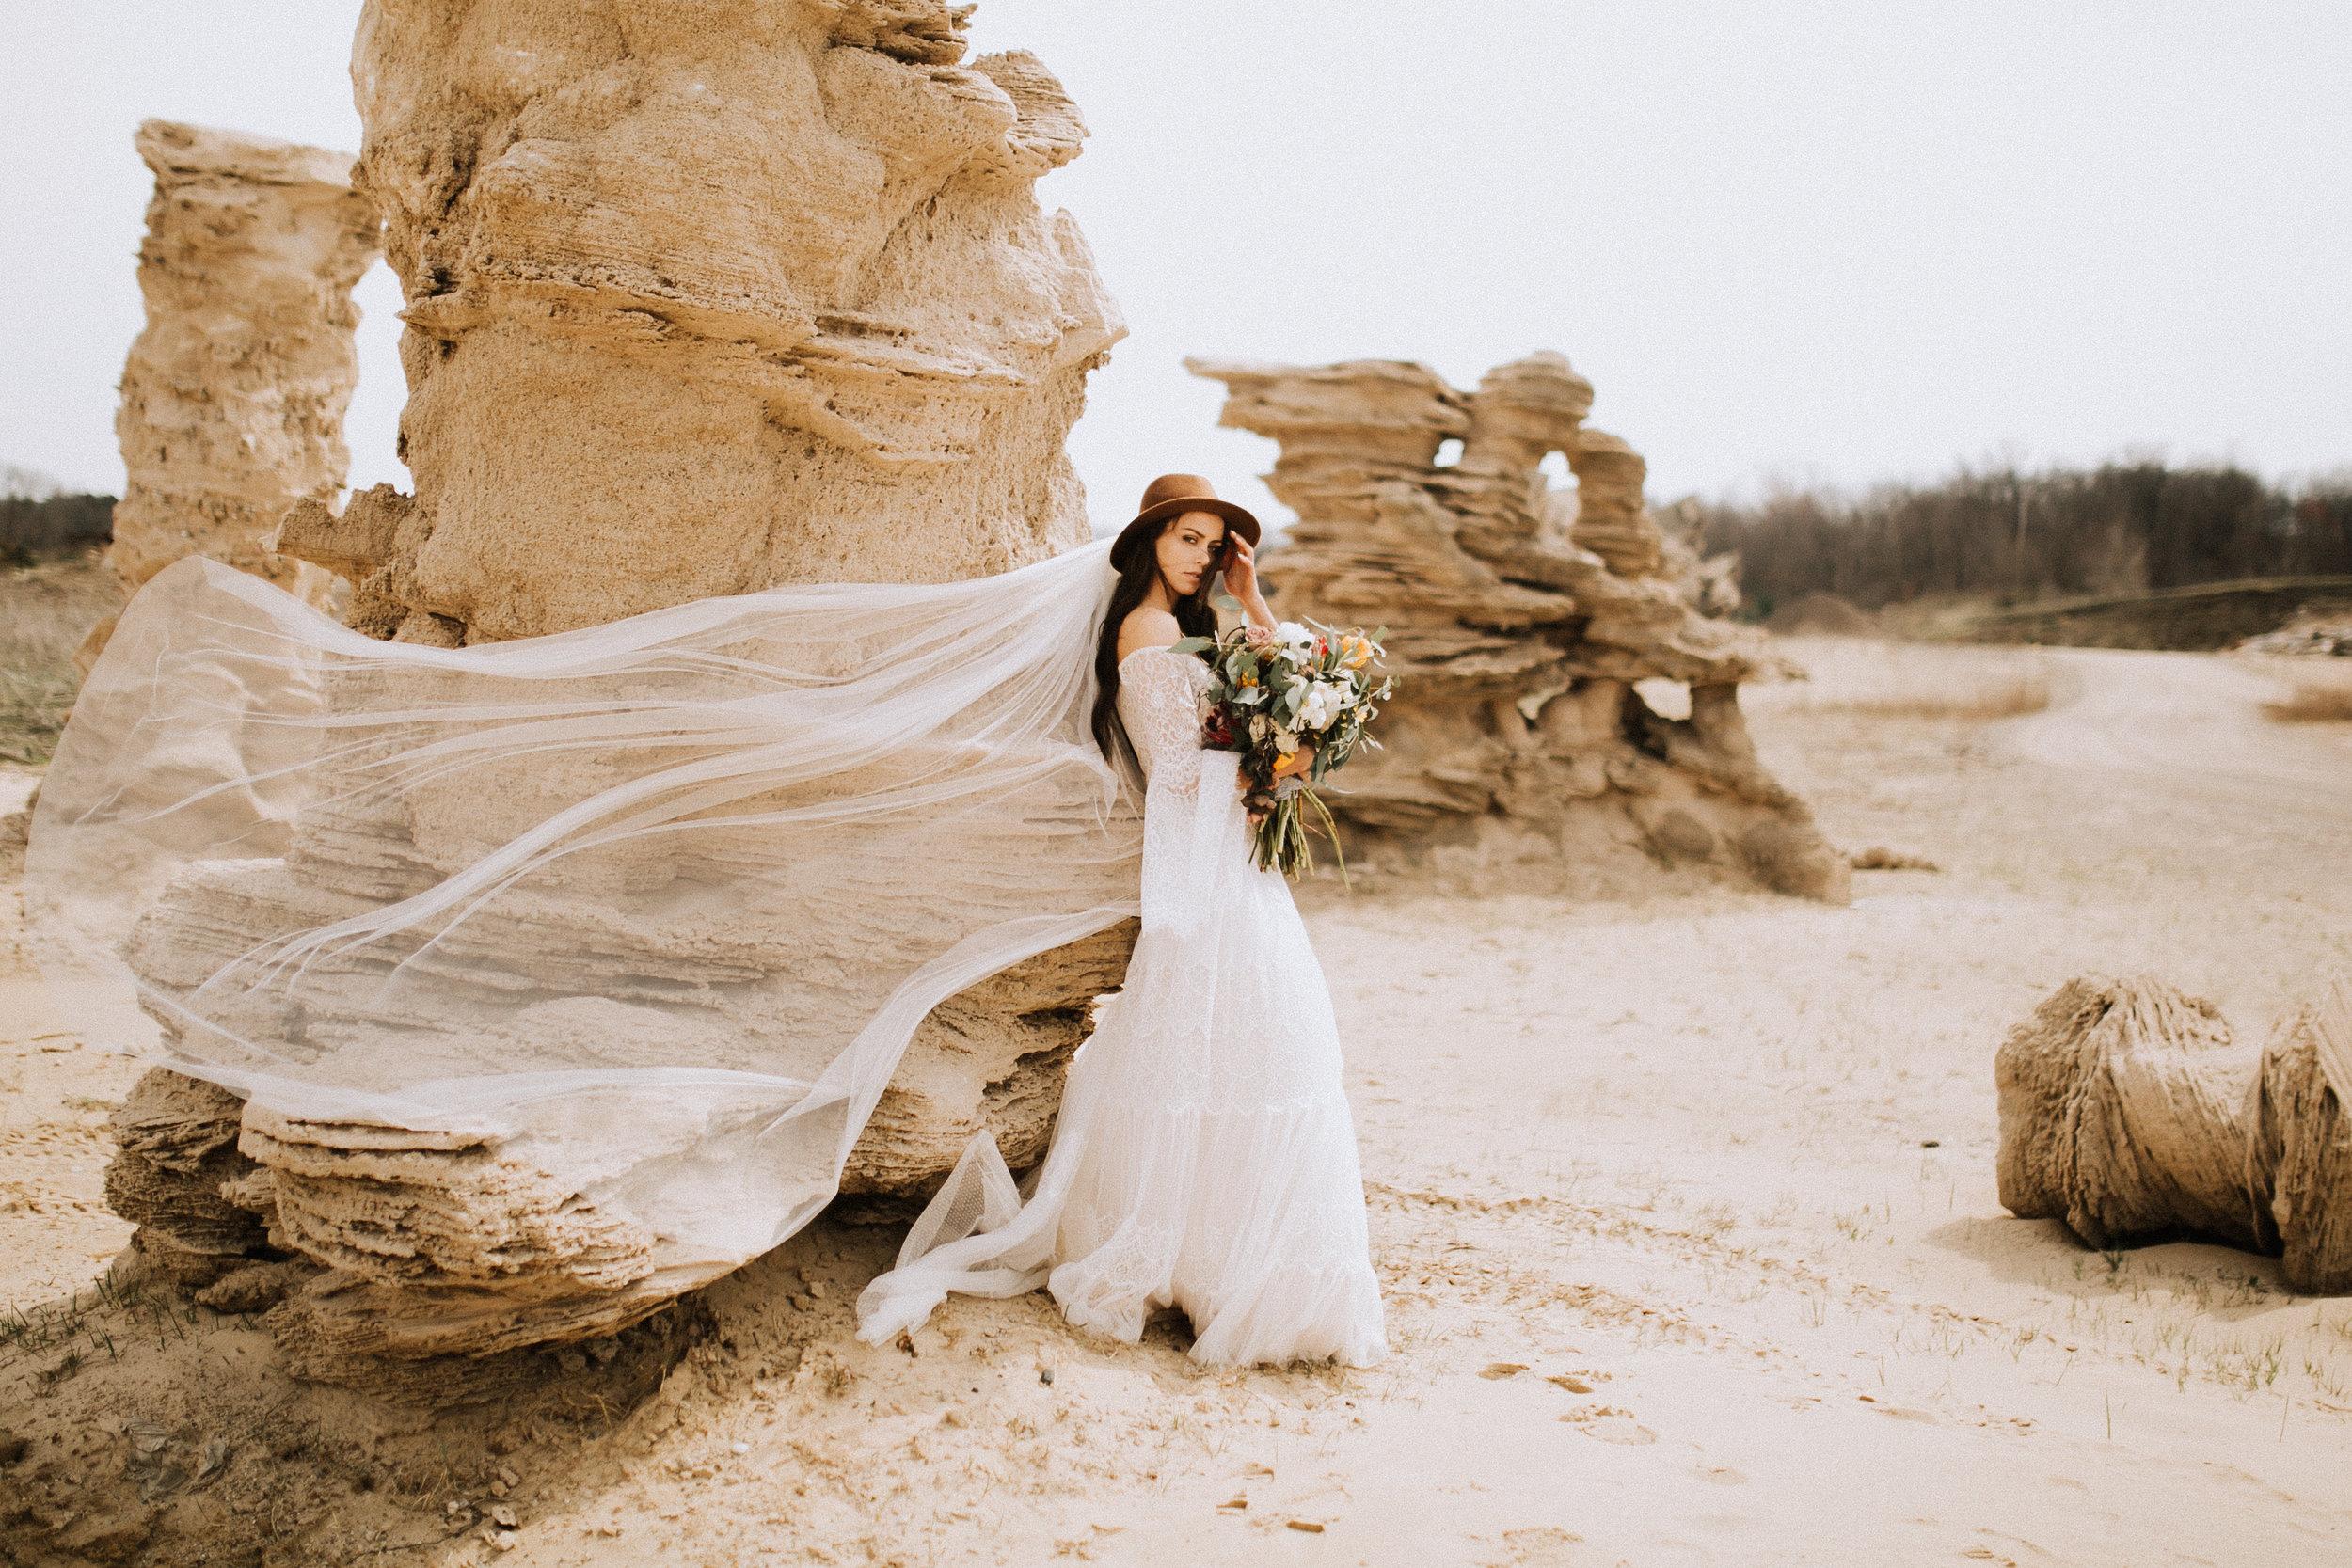 Chelsea Seekell Photography, Gabby Hulst Storytelling, Model: Rachel Pierce